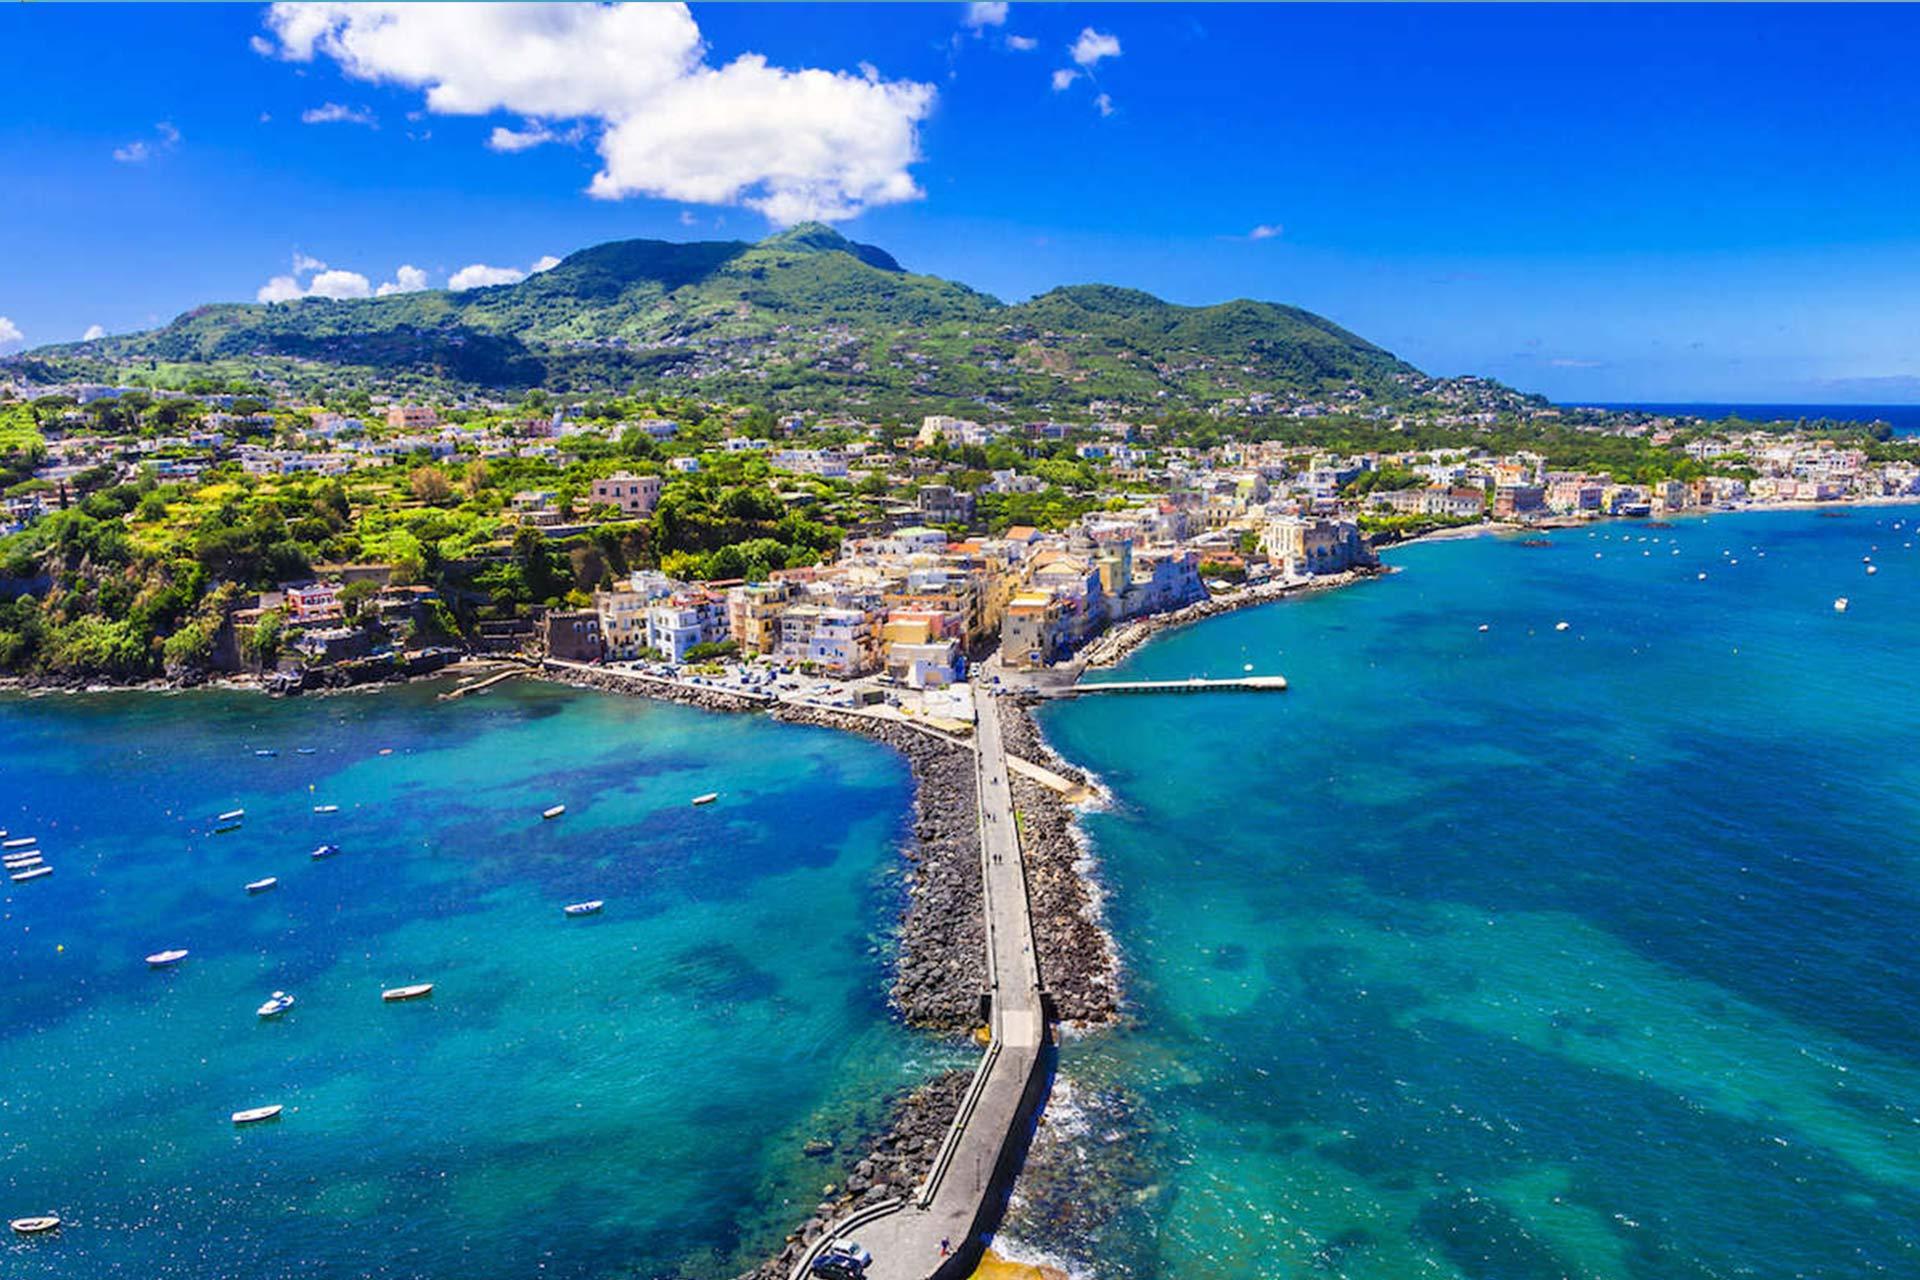 rental-boat-tour-ischia-amalfi-positano-capri-sorrento